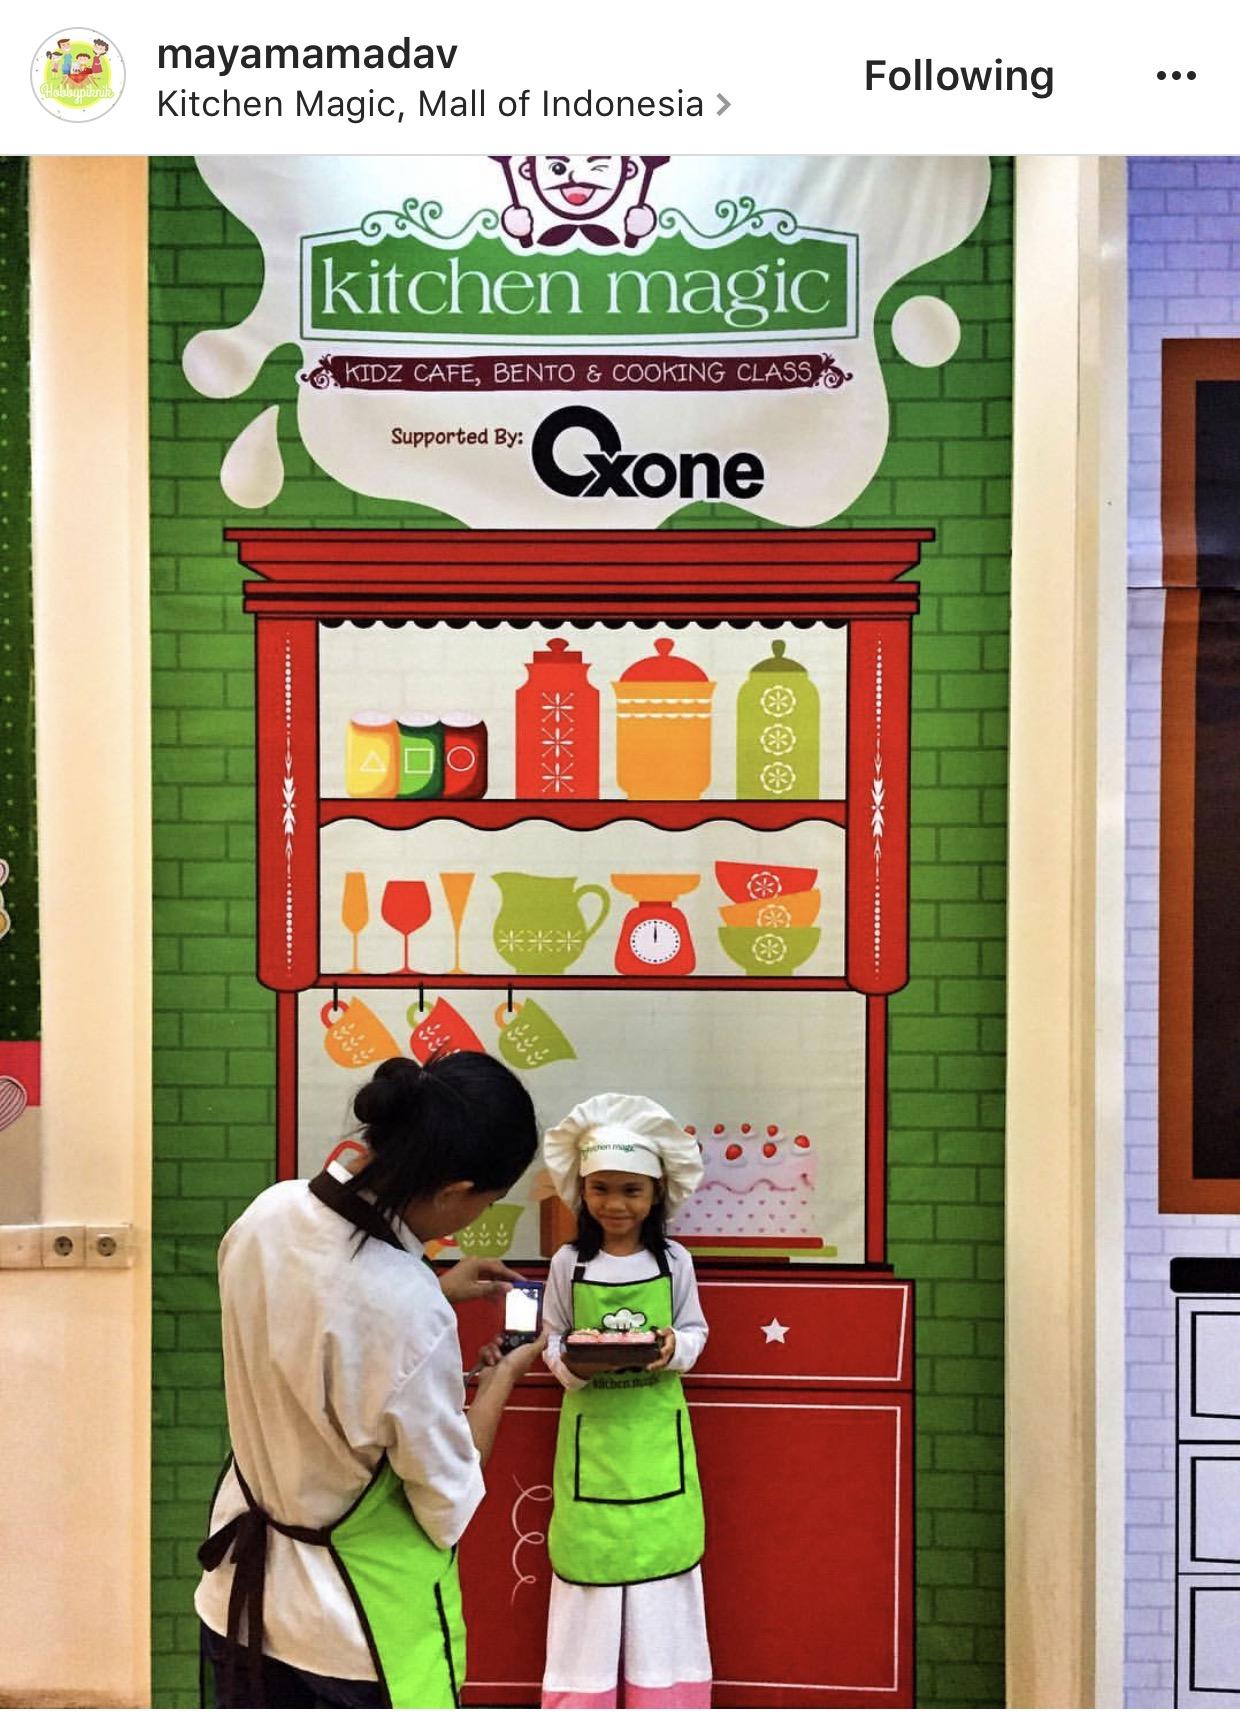 Liburananak kitchenmagic liburananak kitchenmagic liburananak kitchenmagic liburananak kitchenmagic kitchen magic indonesia